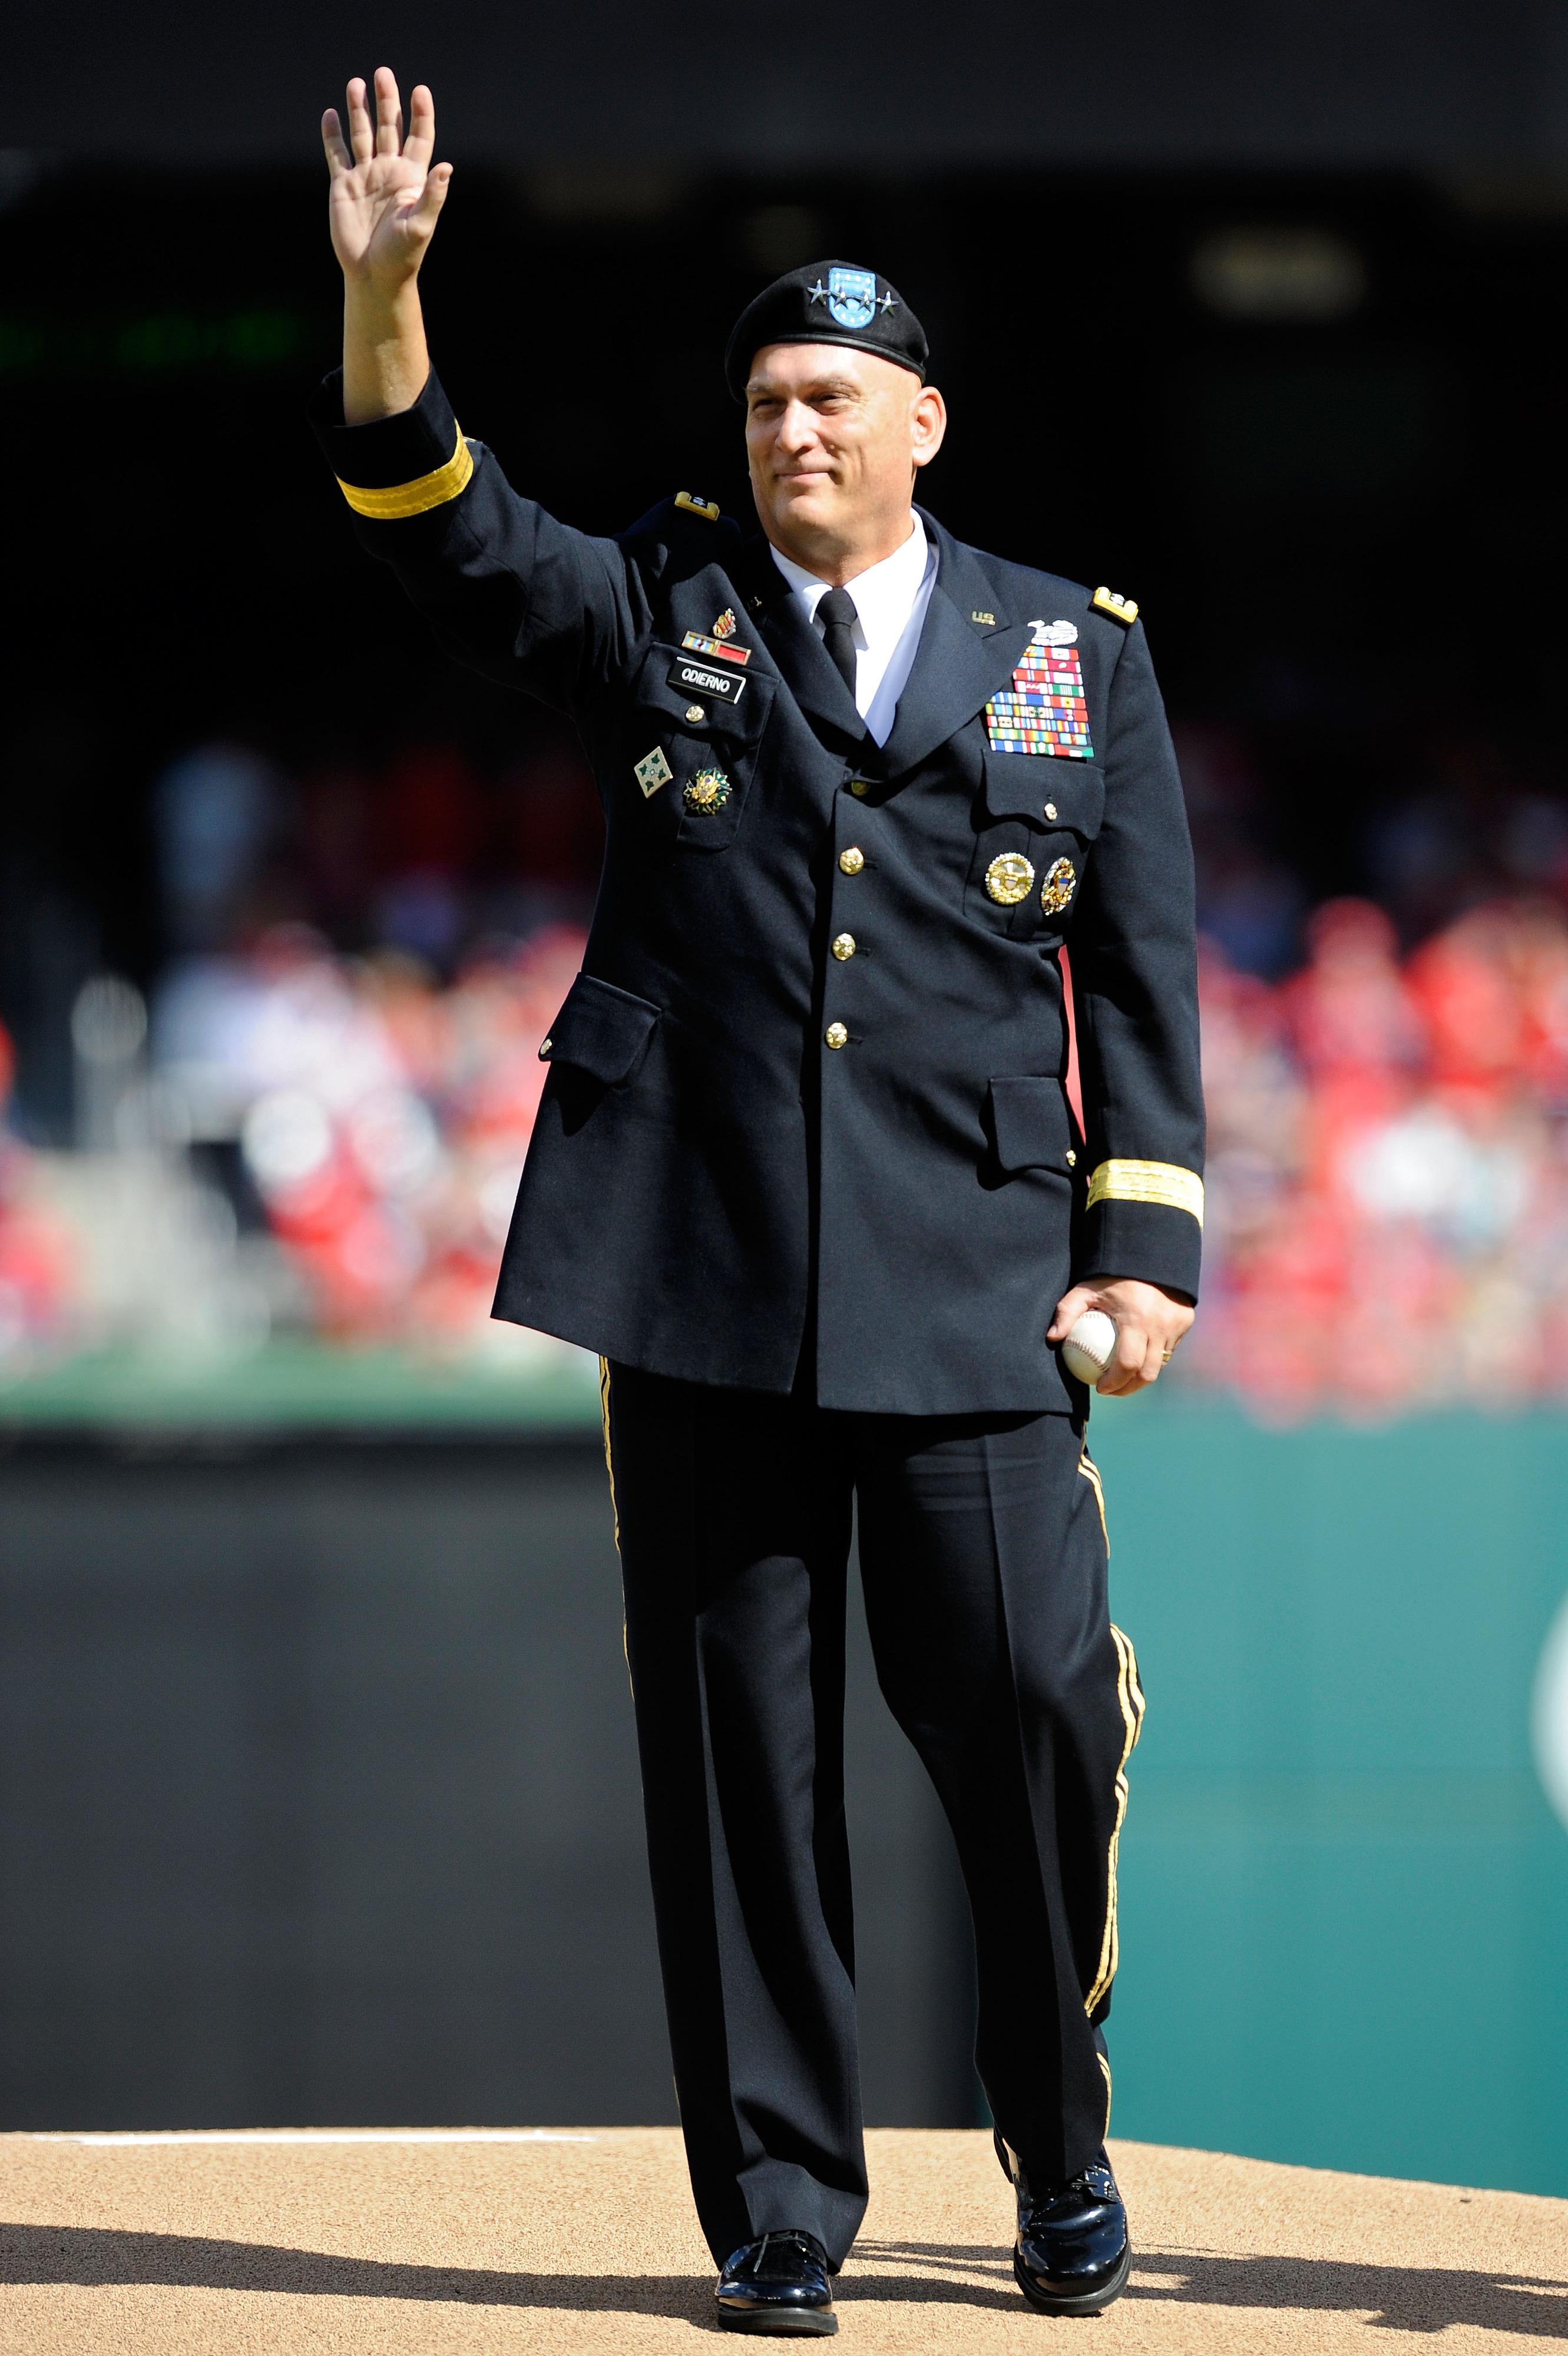 General Raymond T. Odierno